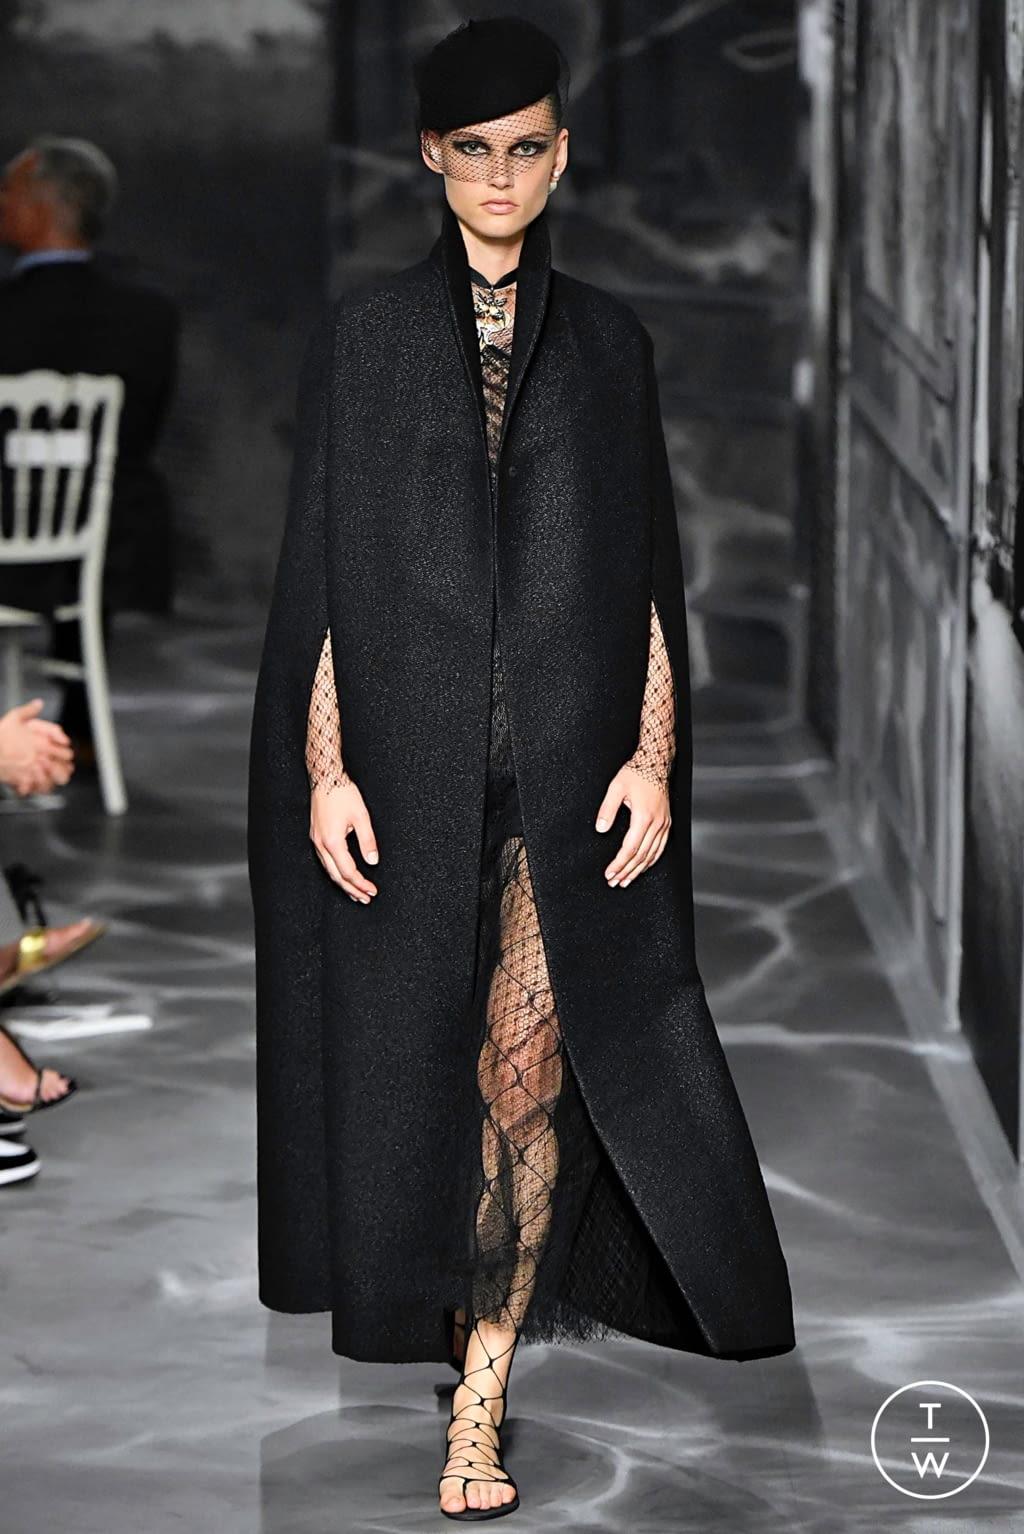 Fashion Week Paris Fall/Winter 2019 look 32 de la collection Christian Dior couture